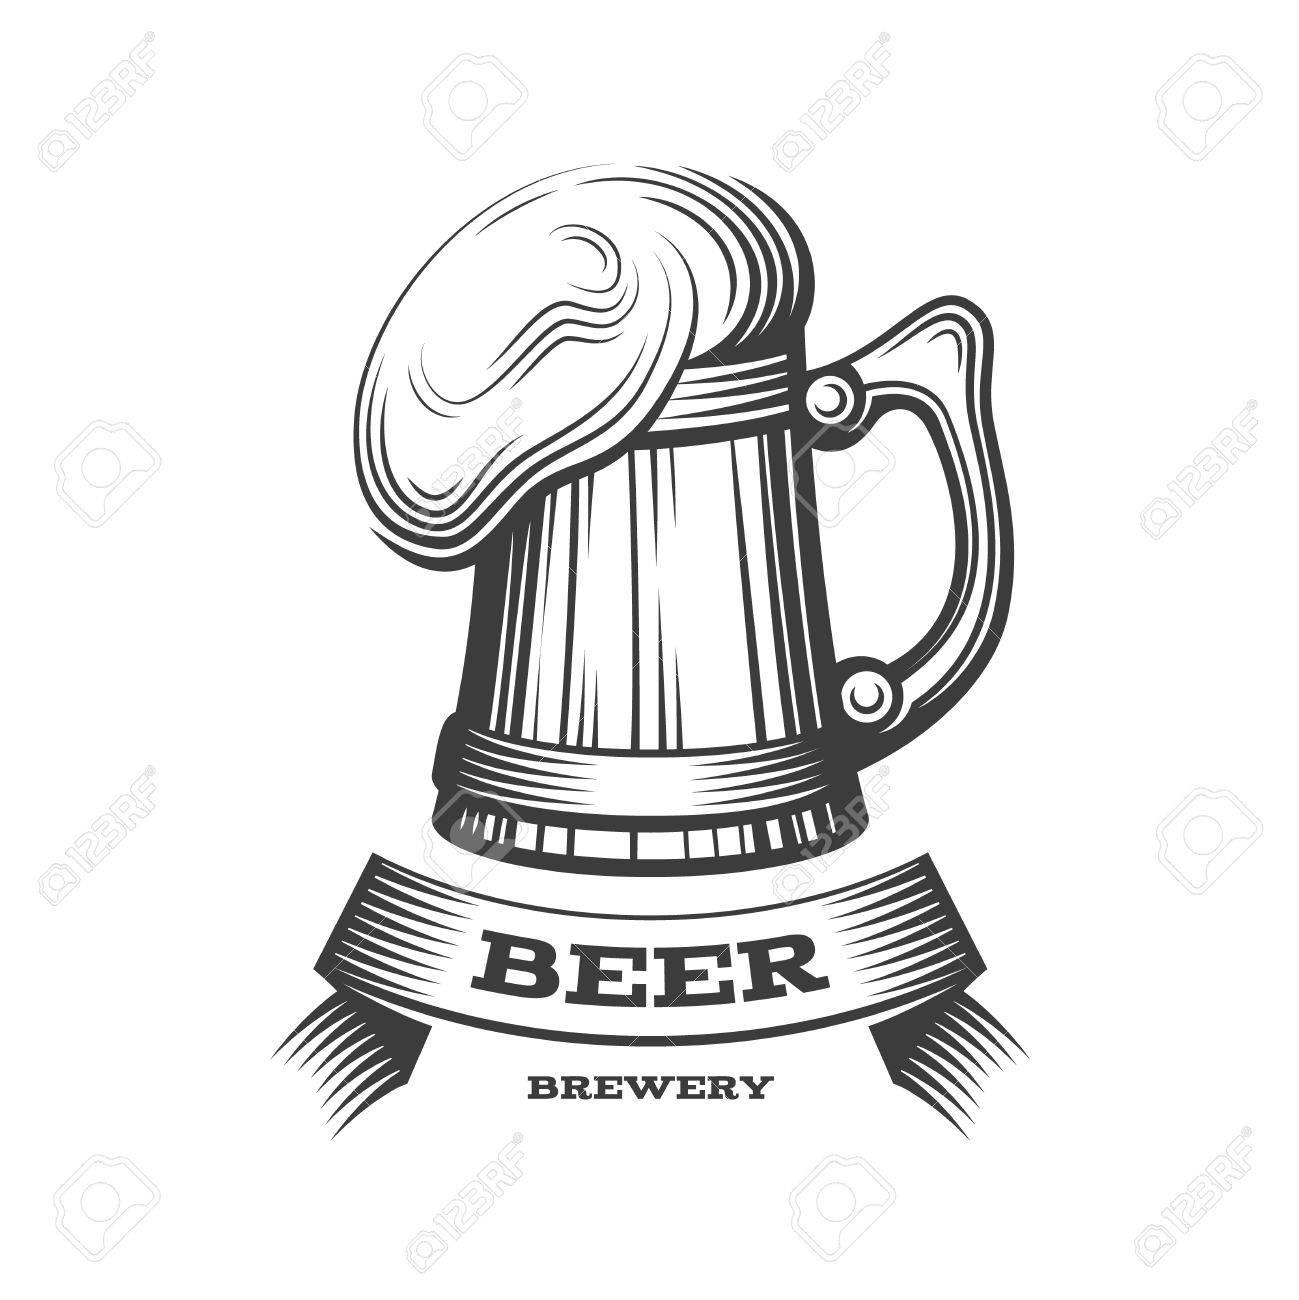 Wooden Beer Mug Logo Vector Illustration Emblem Brewery Design Royalty Free Cliparts Vectors And Stock Illustration Image 80709873